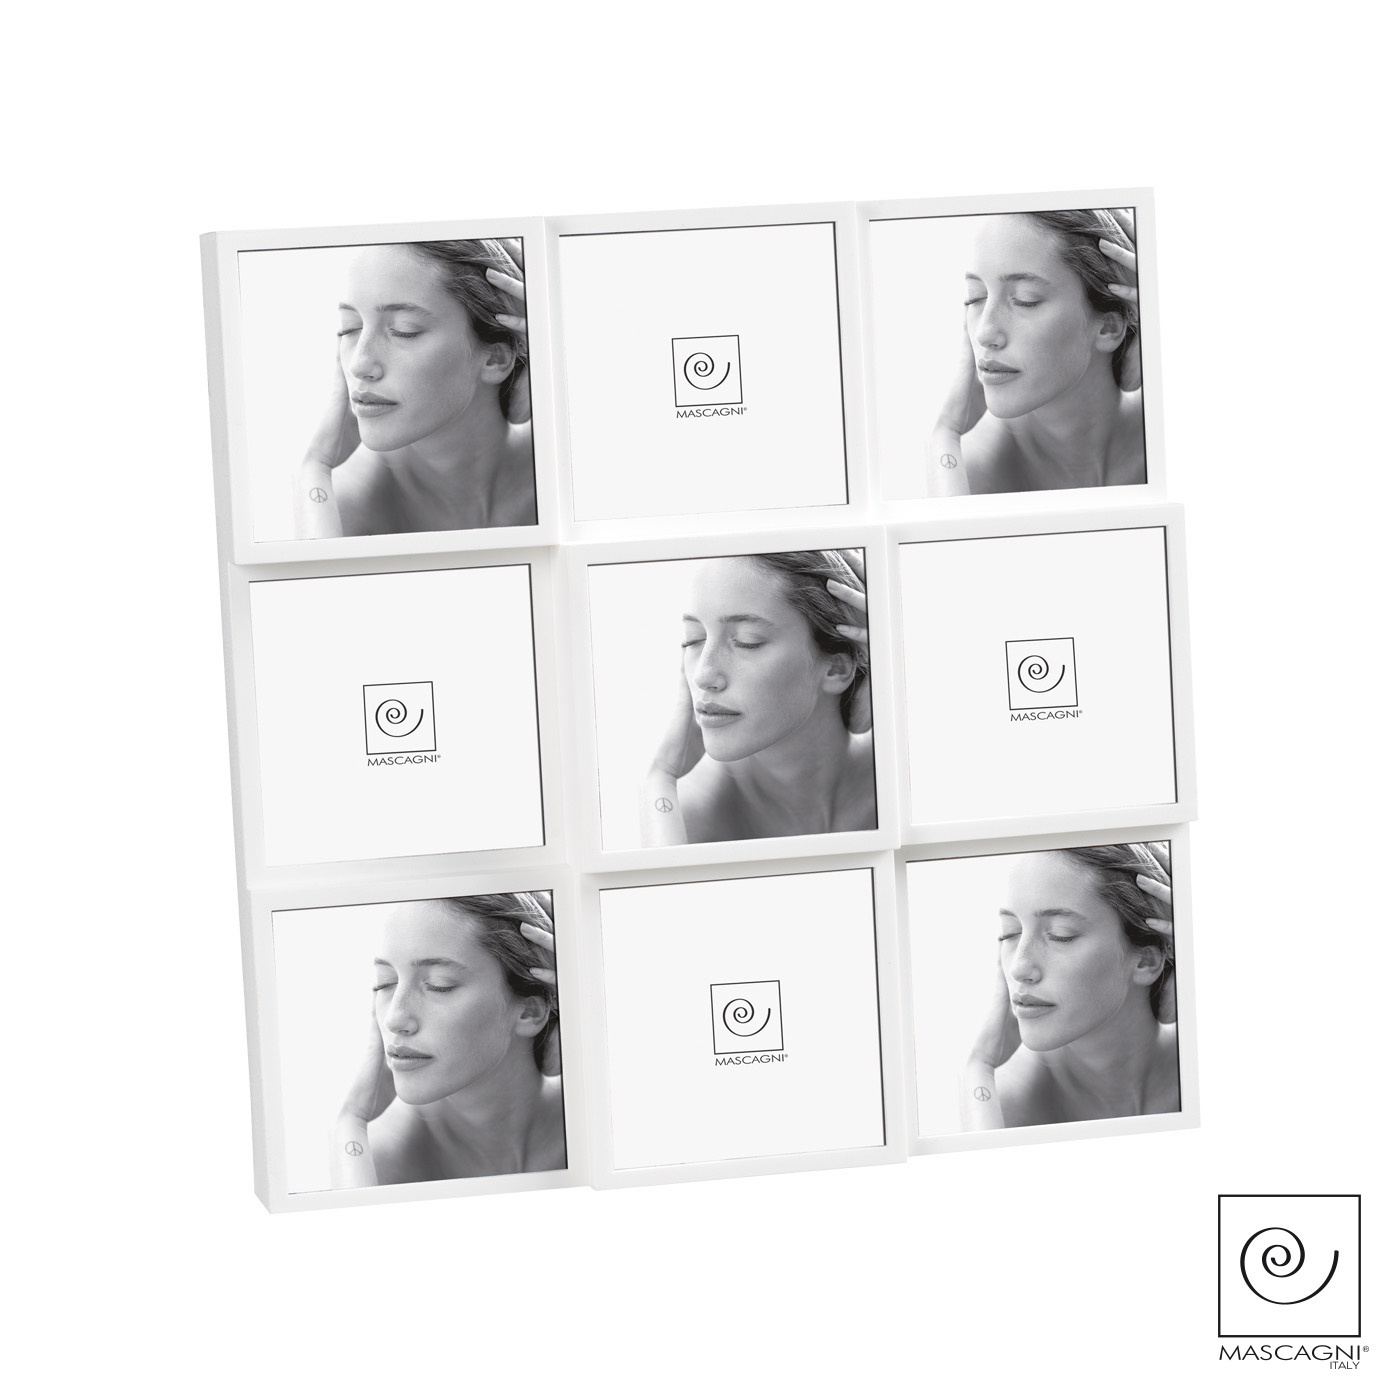 Art Mascagni A907 MULTIPLE FRAME 9 PHOTOS COL.WHITE